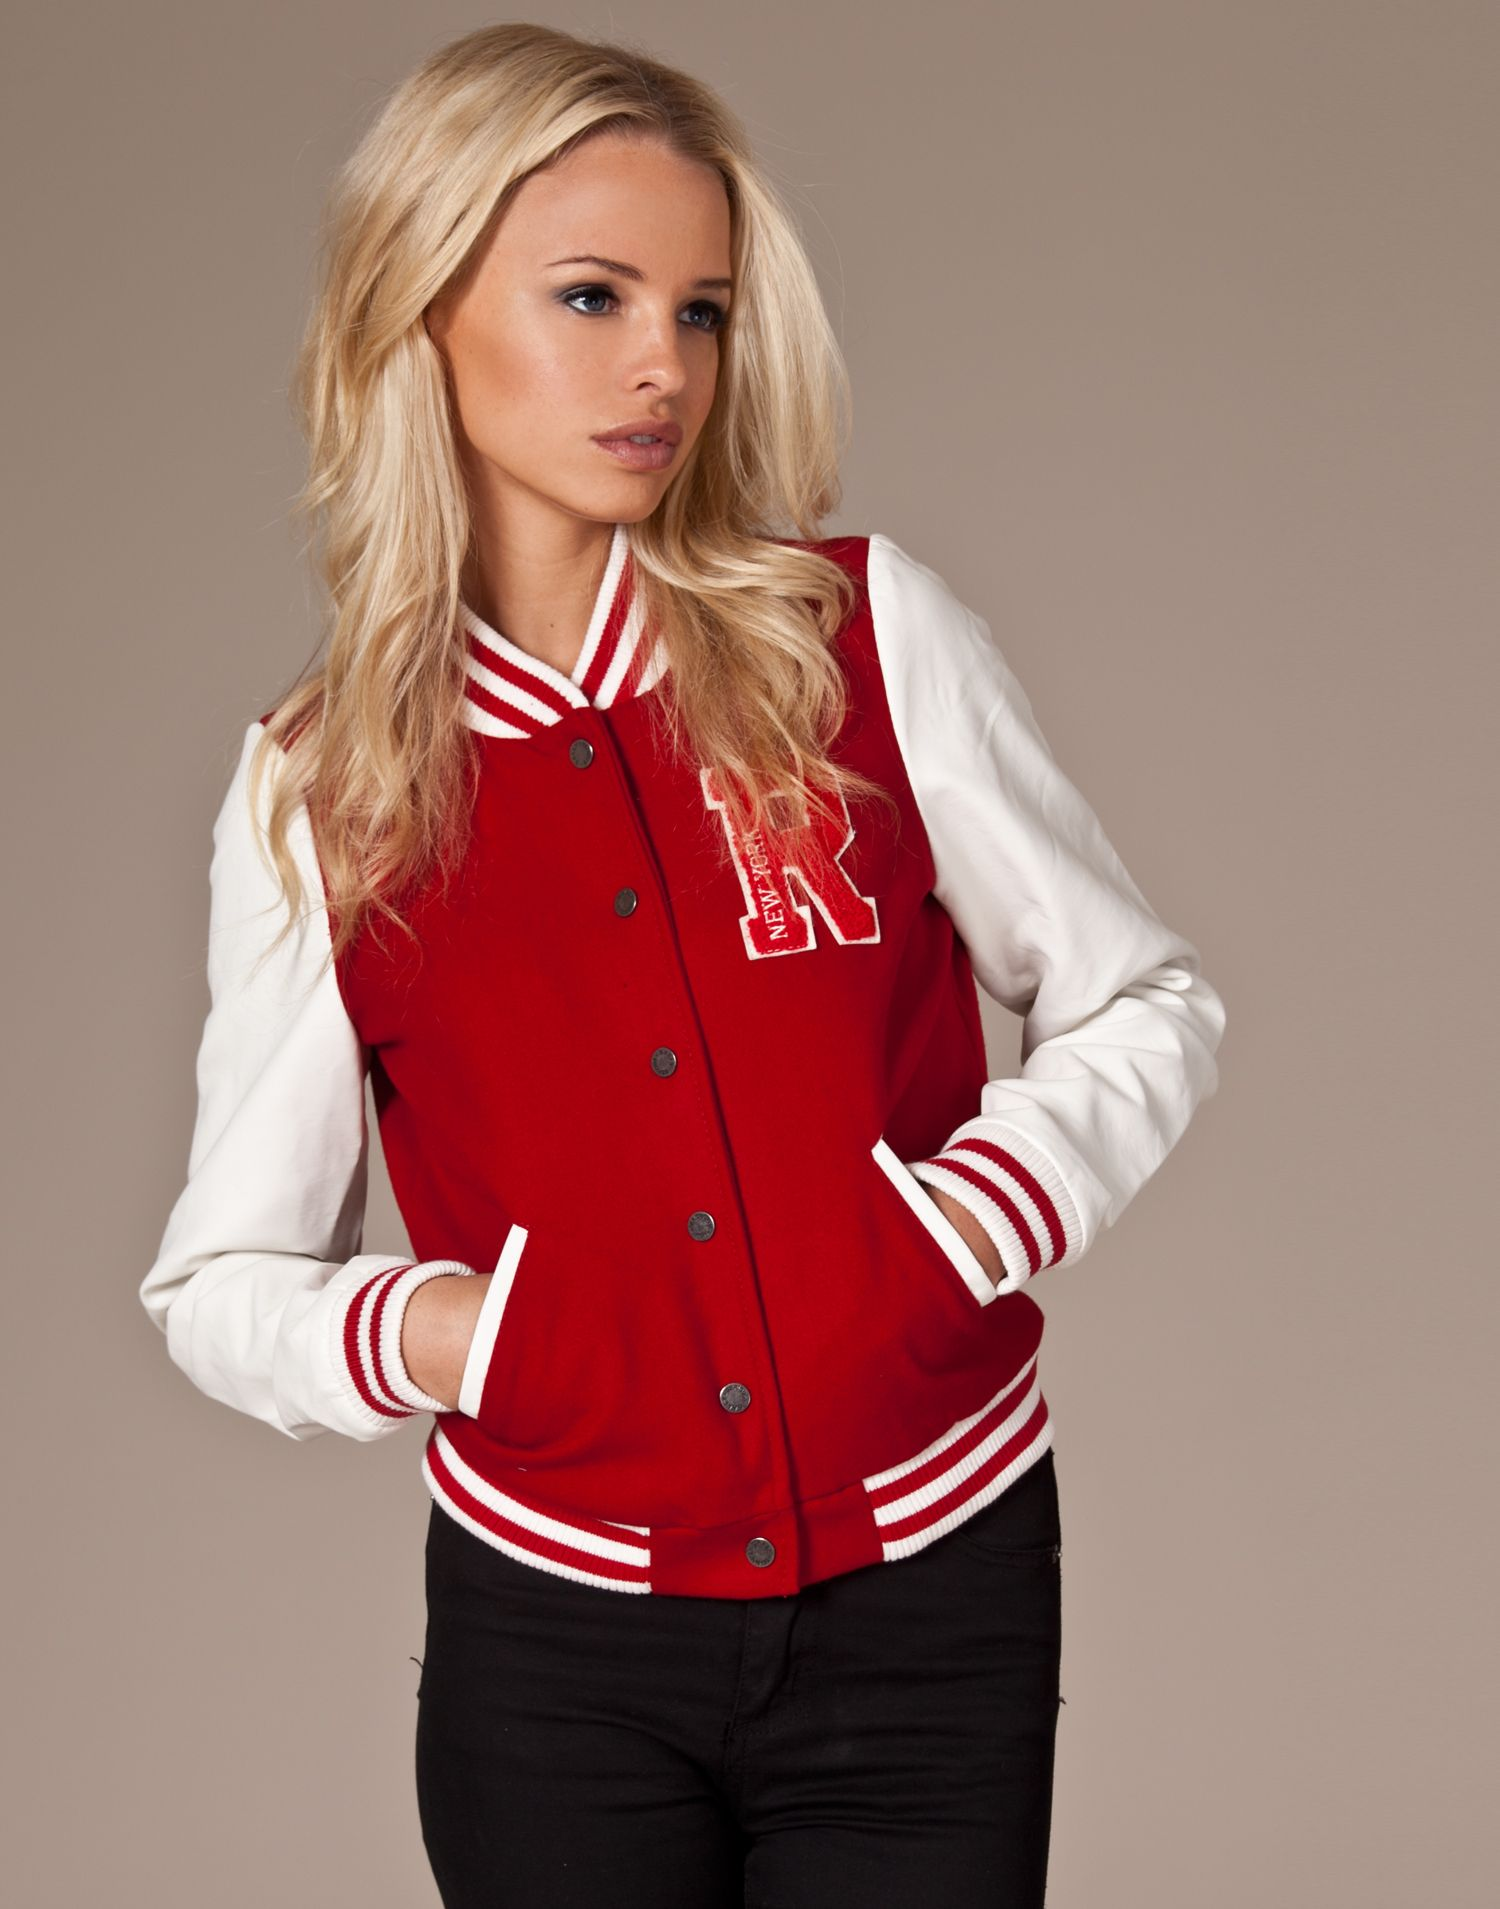 Jacket - Rut m.fl. - Rood - Jassen - Kleding - NELLY.COM Mode online